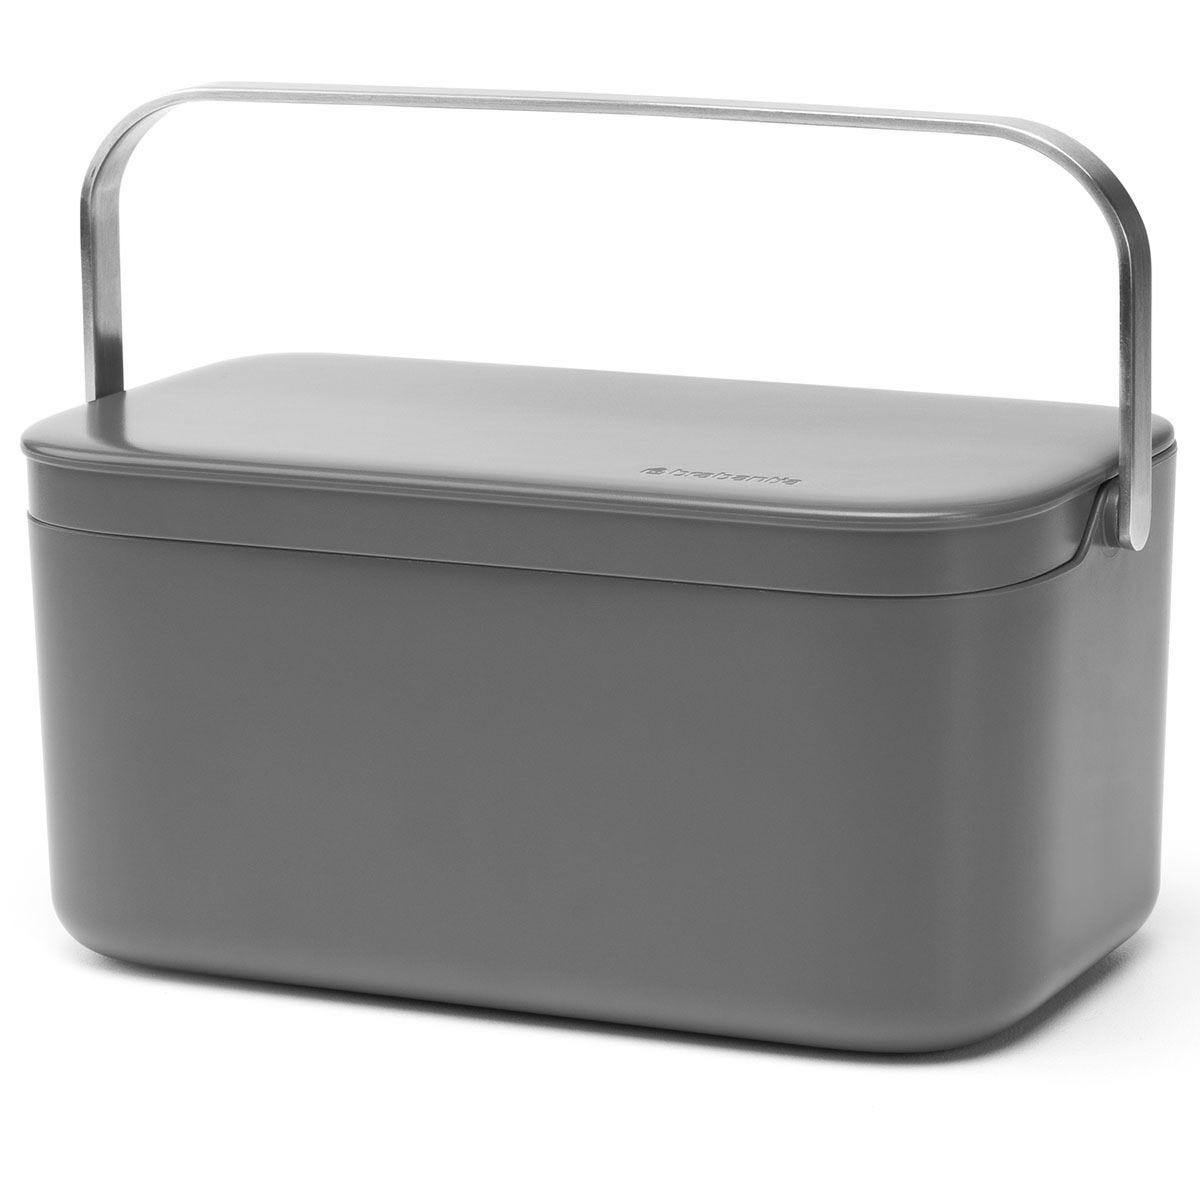 Brabantia Food Waste Caddy - Grey